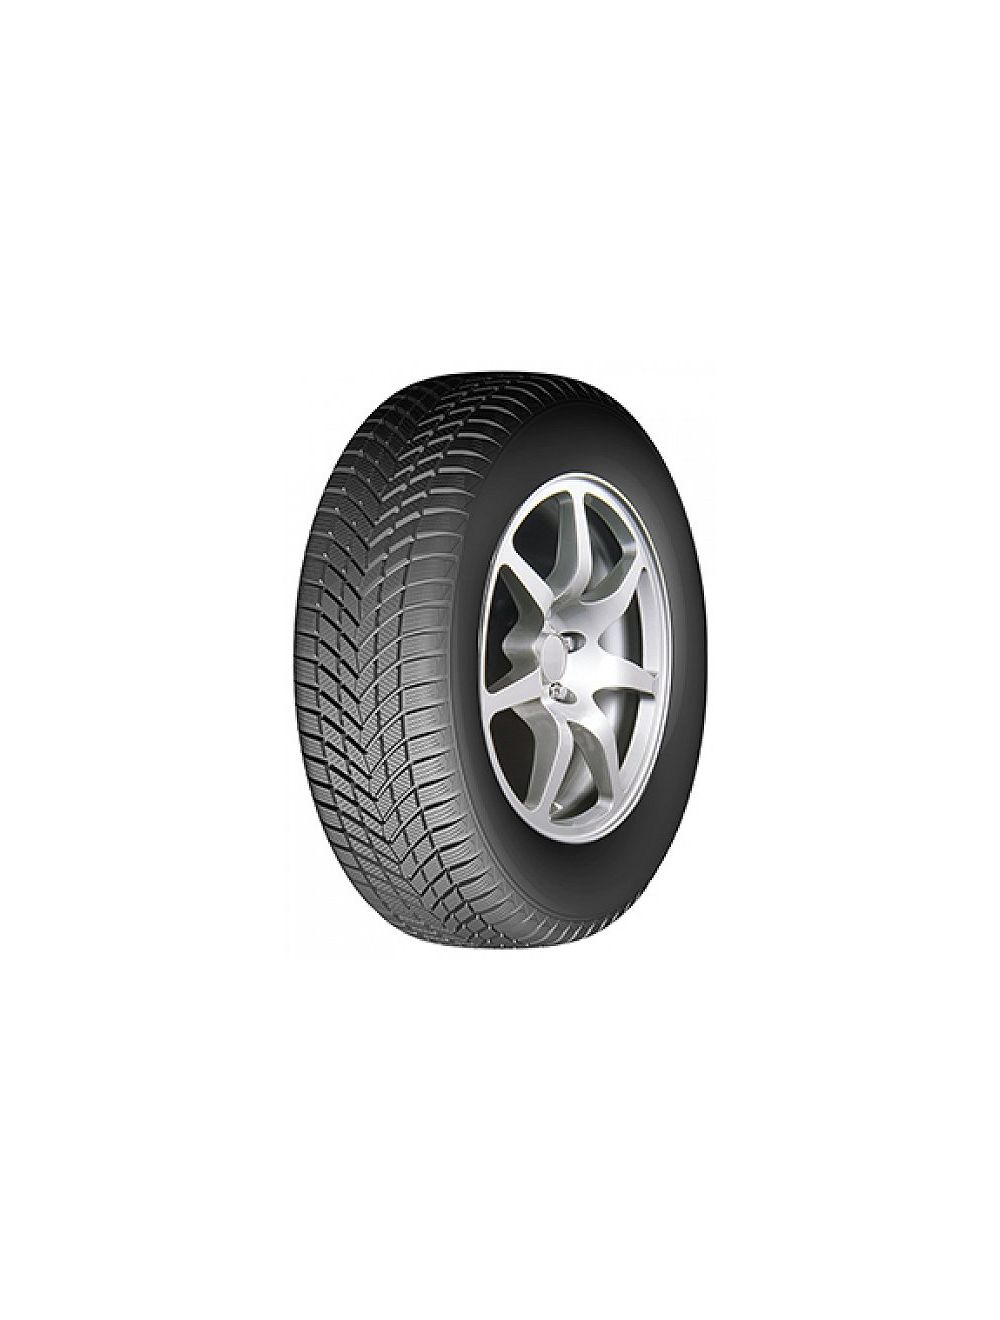 Infinity 155/65R14 T EcoZen Téli gumi